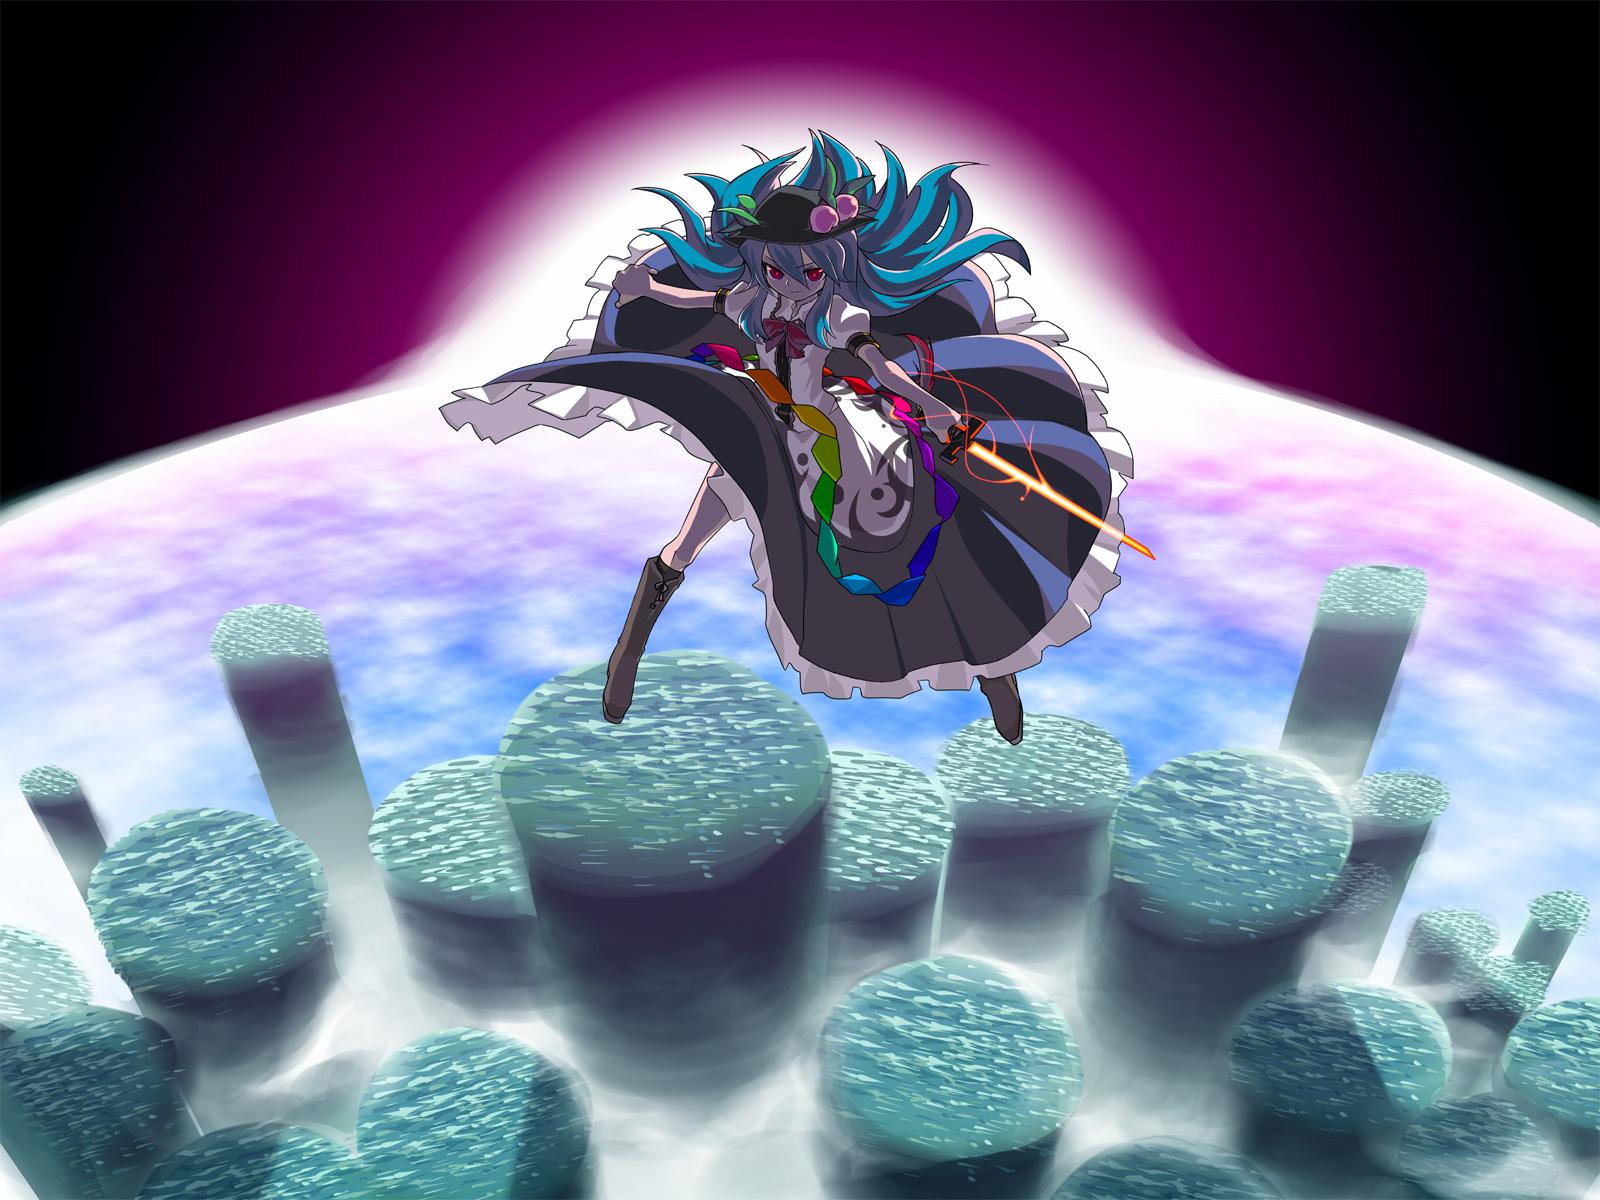 blue_hair boots dress hat hinanawi_tenshi long_hair red_eyes sky sword touhou weapon